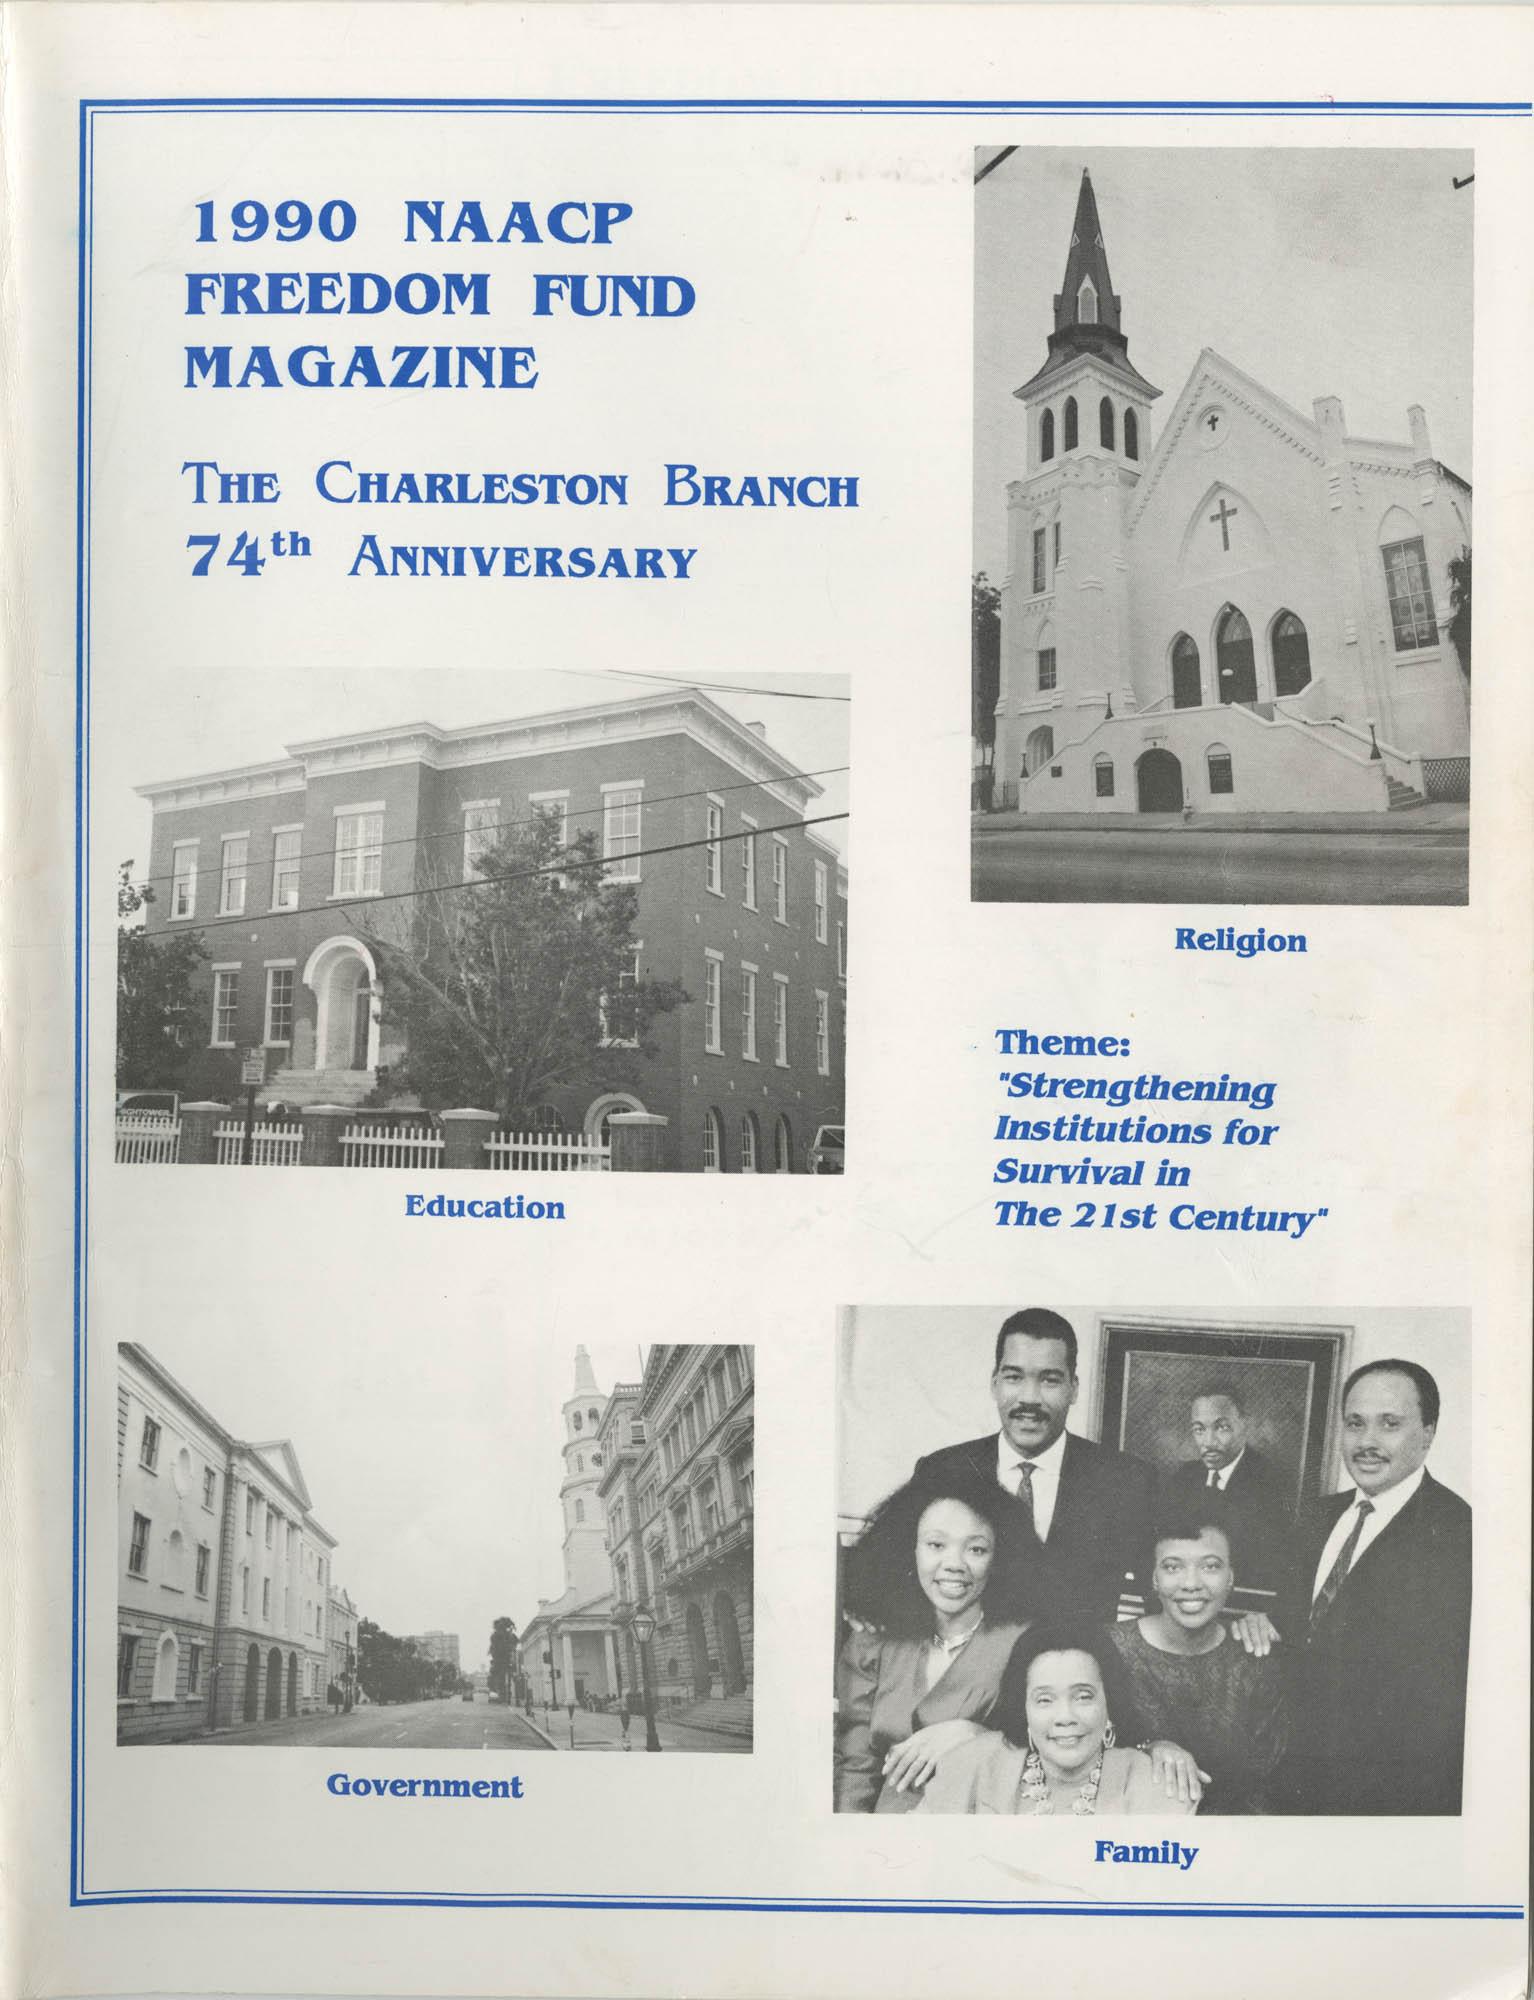 1990 NAACP Freedom Fund Magazine, Charleston Branch of the NAACP, 74th Anniversary